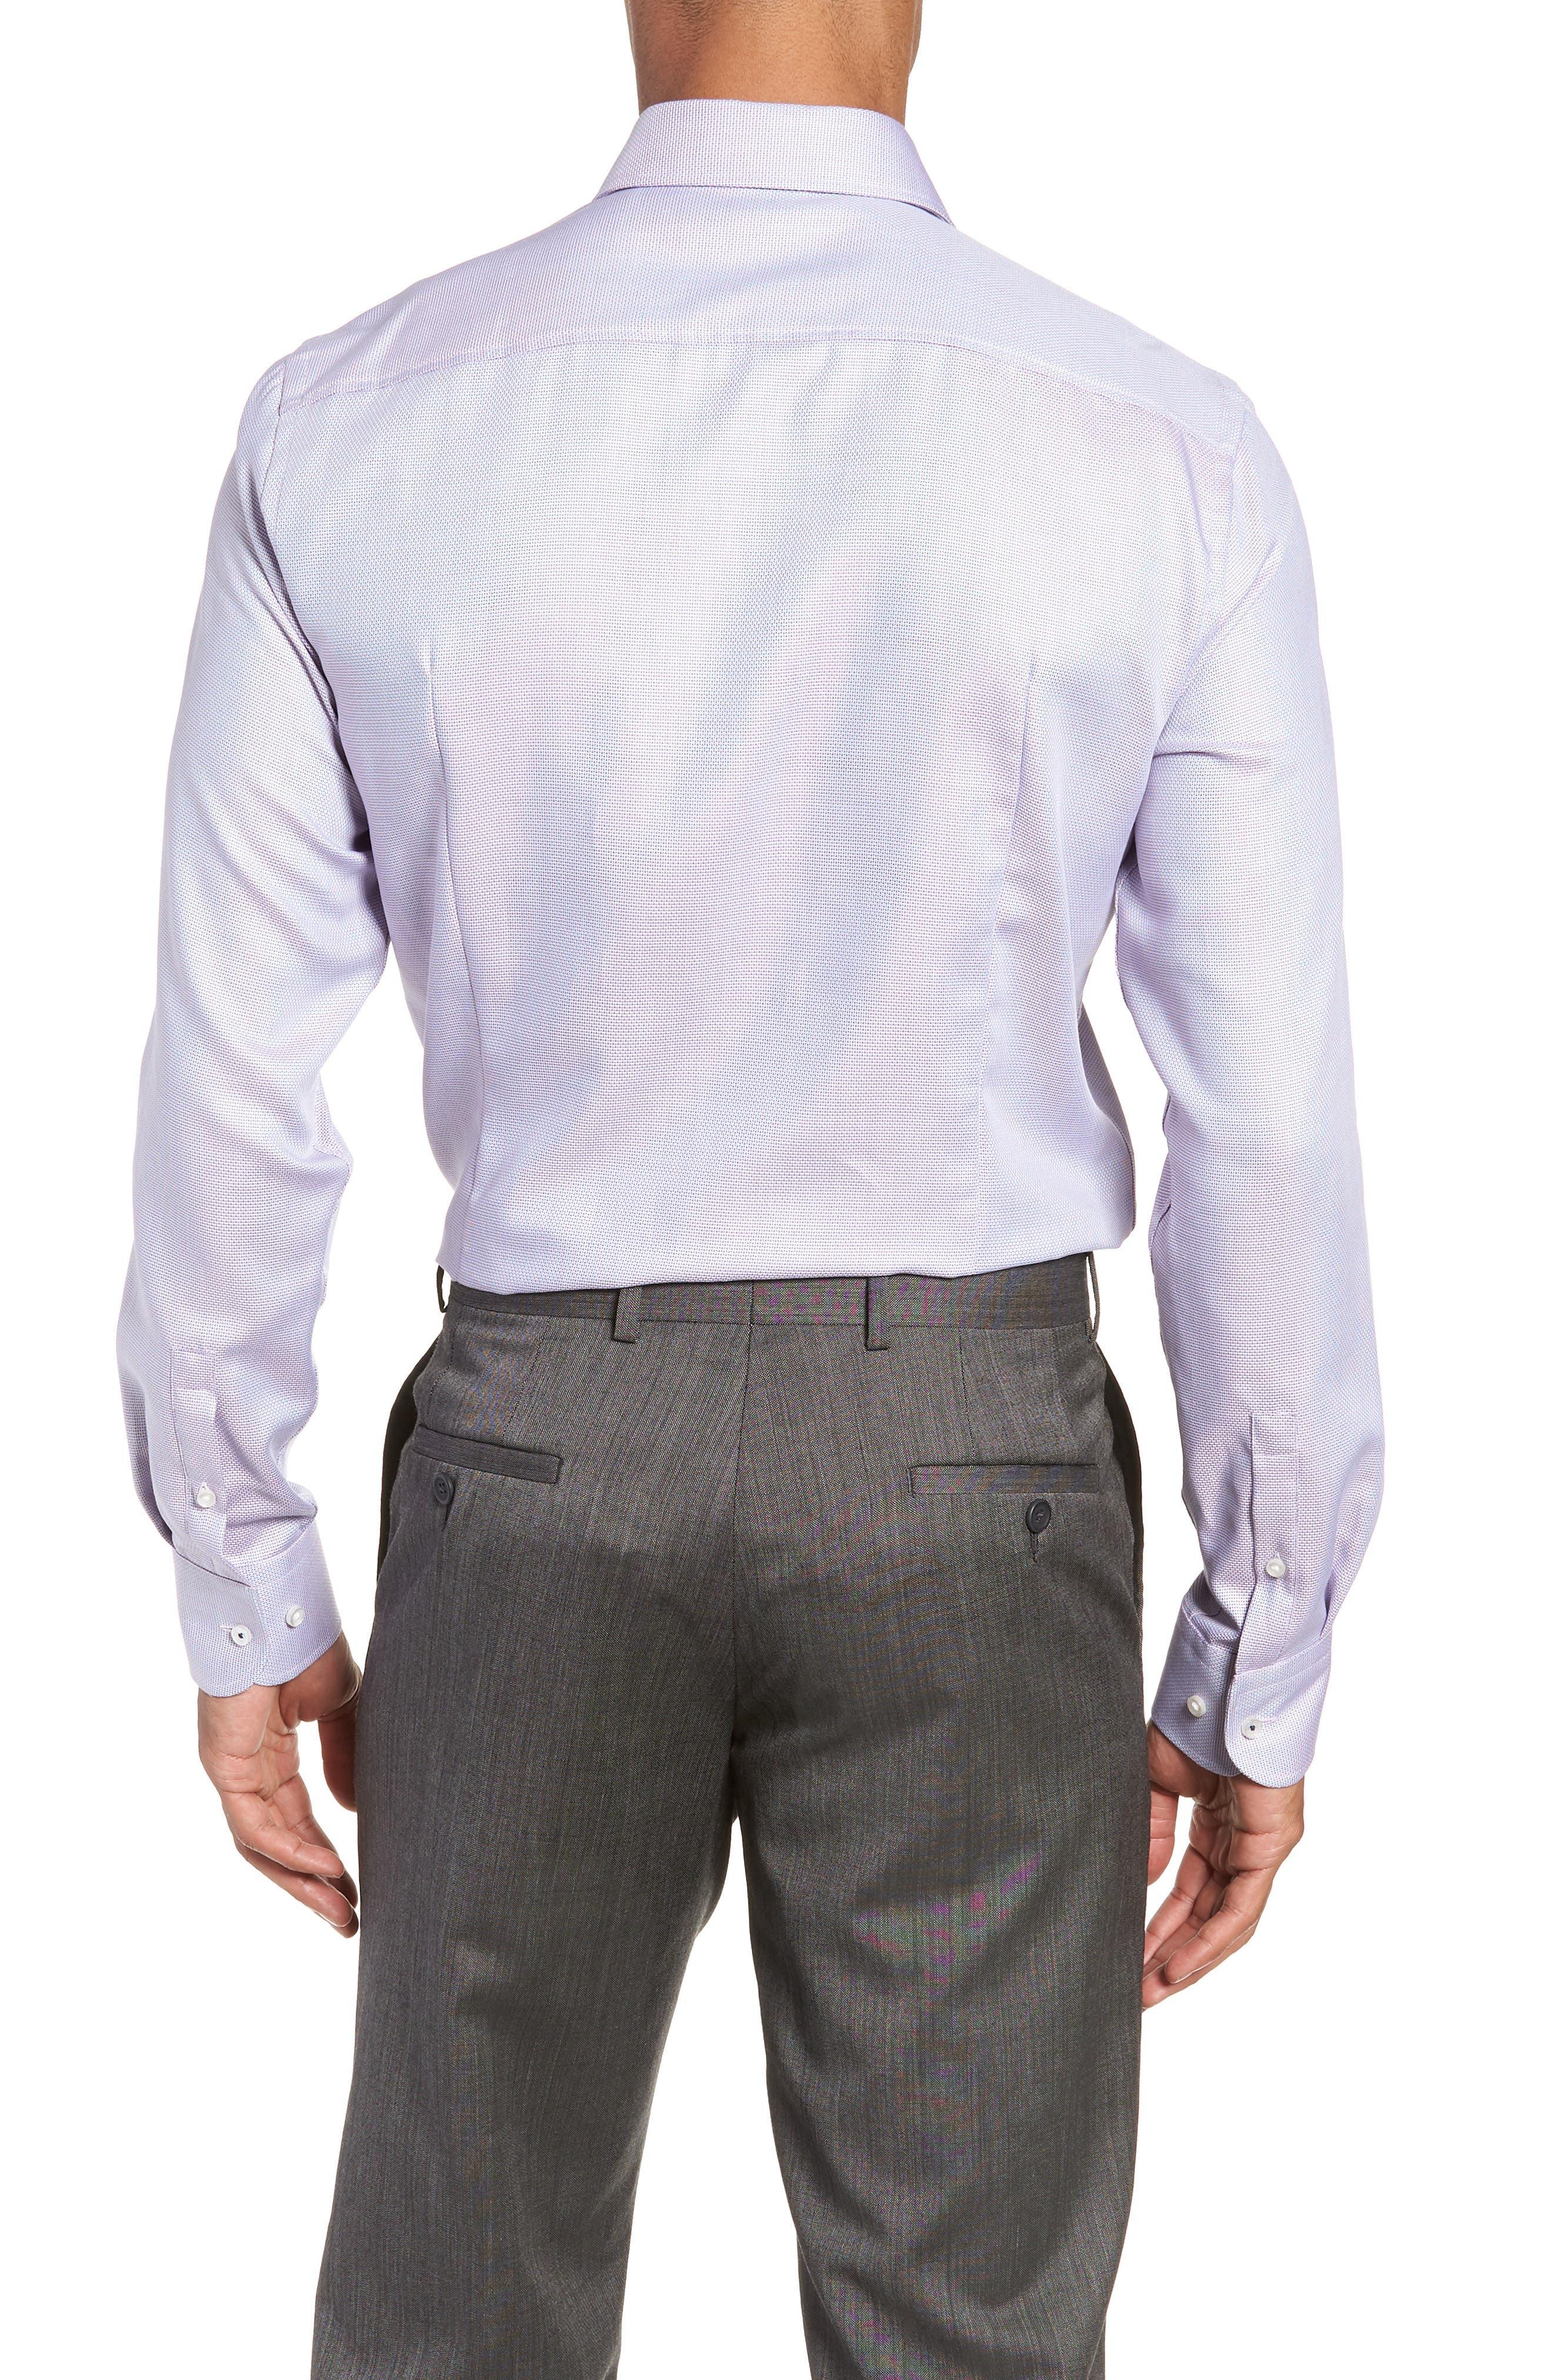 x Nordstrom Jerrin Slim Fit Solid Dress Shirt,                             Alternate thumbnail 3, color,                             LAVENDER